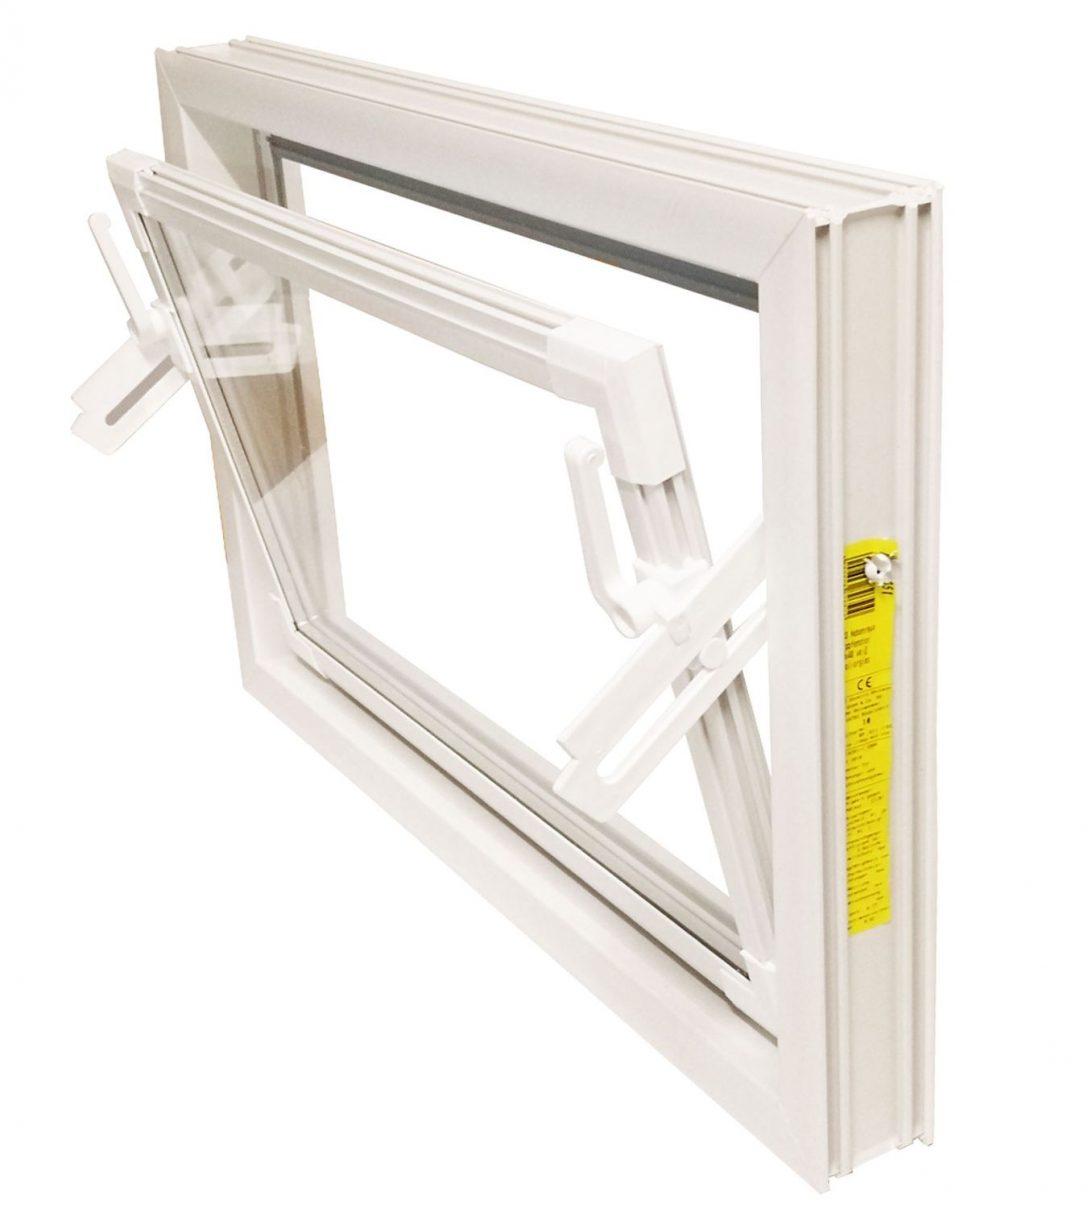 Large Size of Aco Fenster 90x60cm Nebenraumfenster Isofenster Kippfenster Wei Plissee Türen Bodentief Marken Günstige Rollos Kbe Trier Maße Folie Velux Einbauen Einbau Fenster Aco Fenster